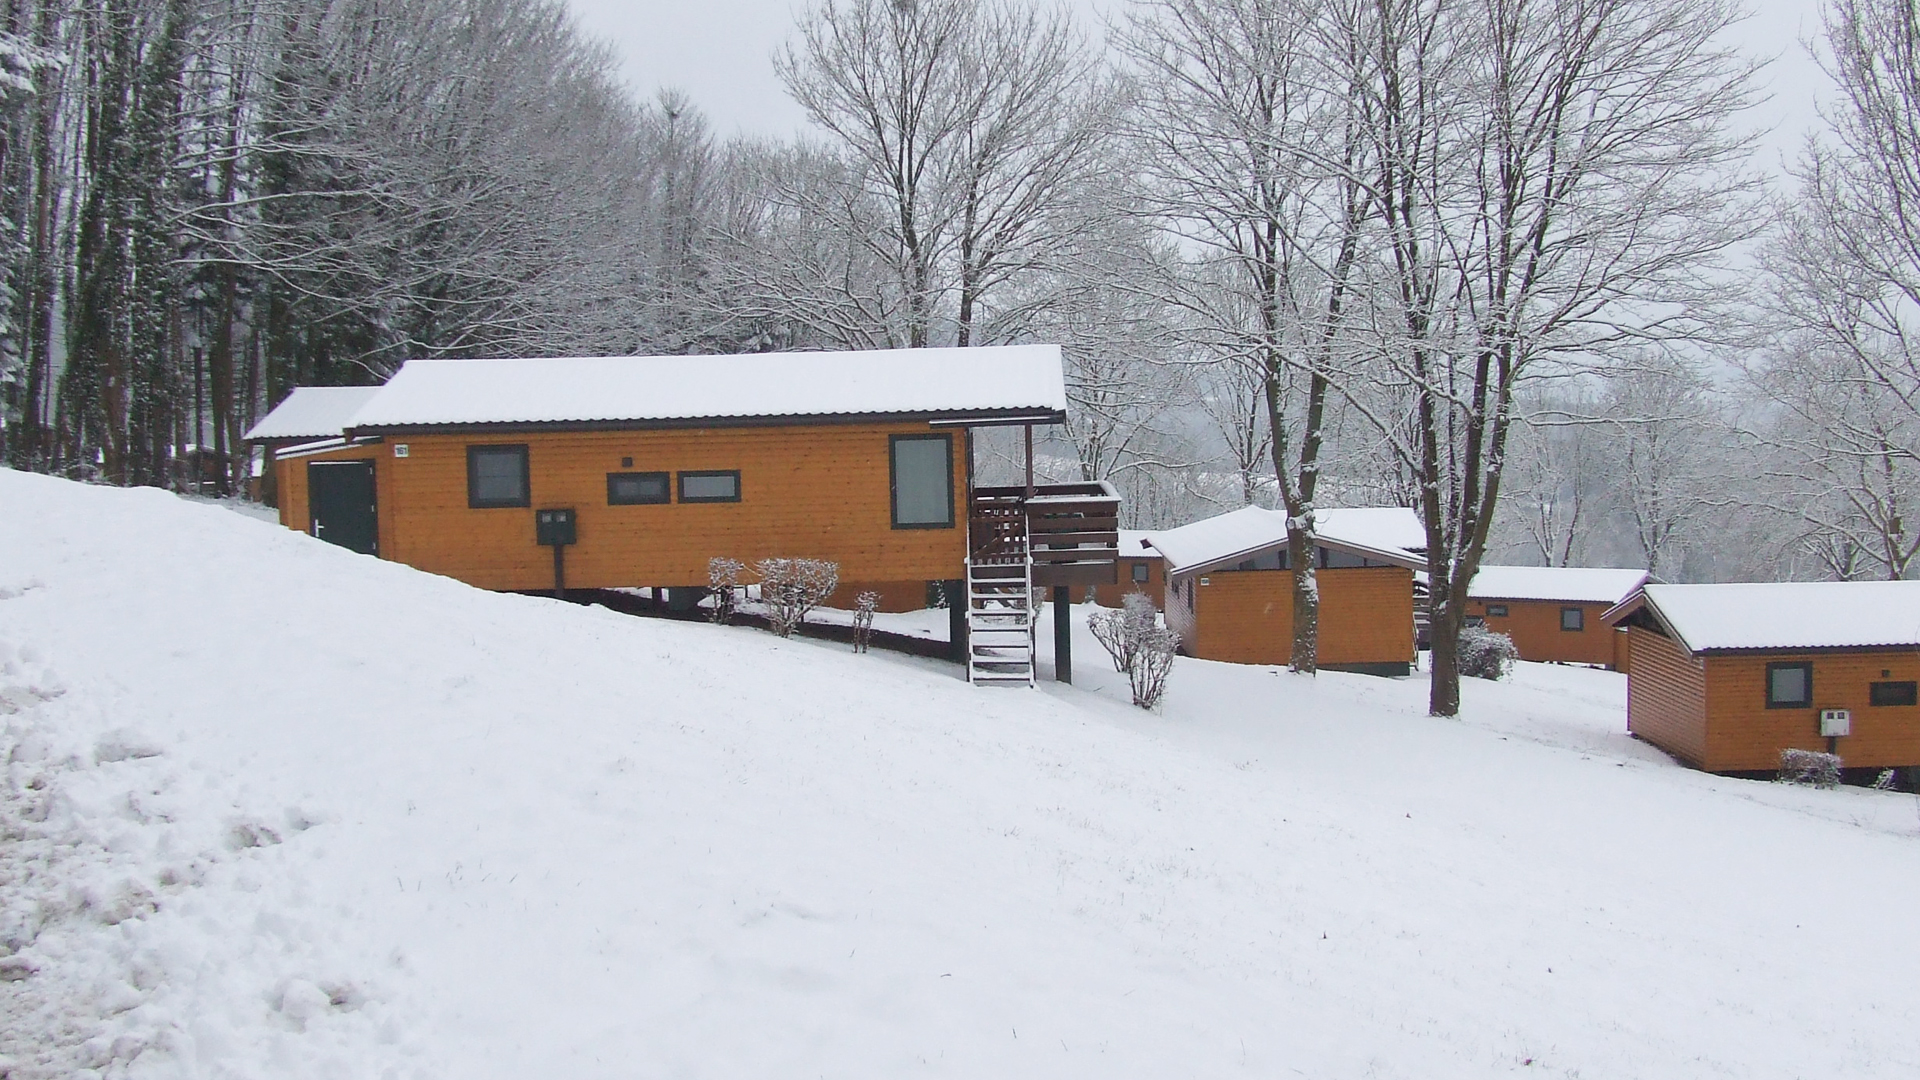 Parque de vacaciones Etoile 2p Blaimont 1